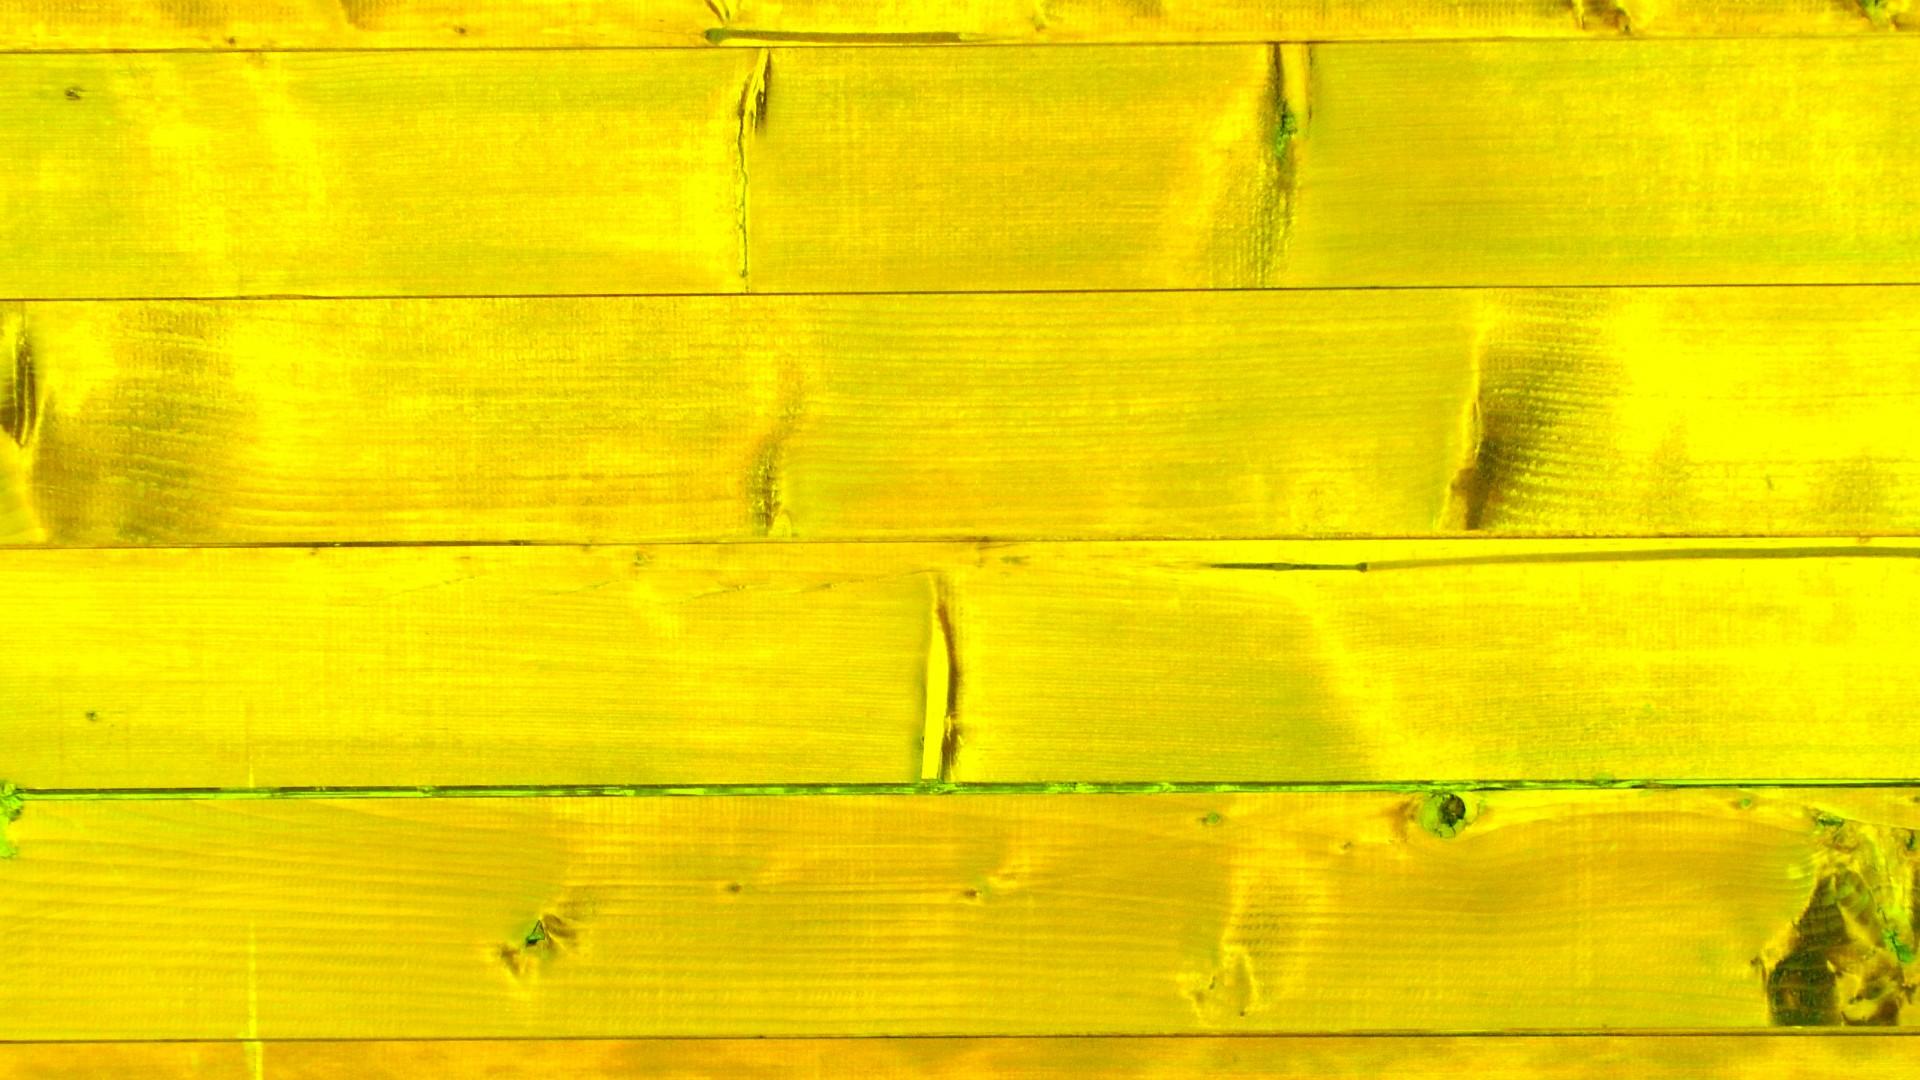 Rustic Fall Desktop Wallpaper Free Photo Yellow Wood Planks Wooden Wooden Planks